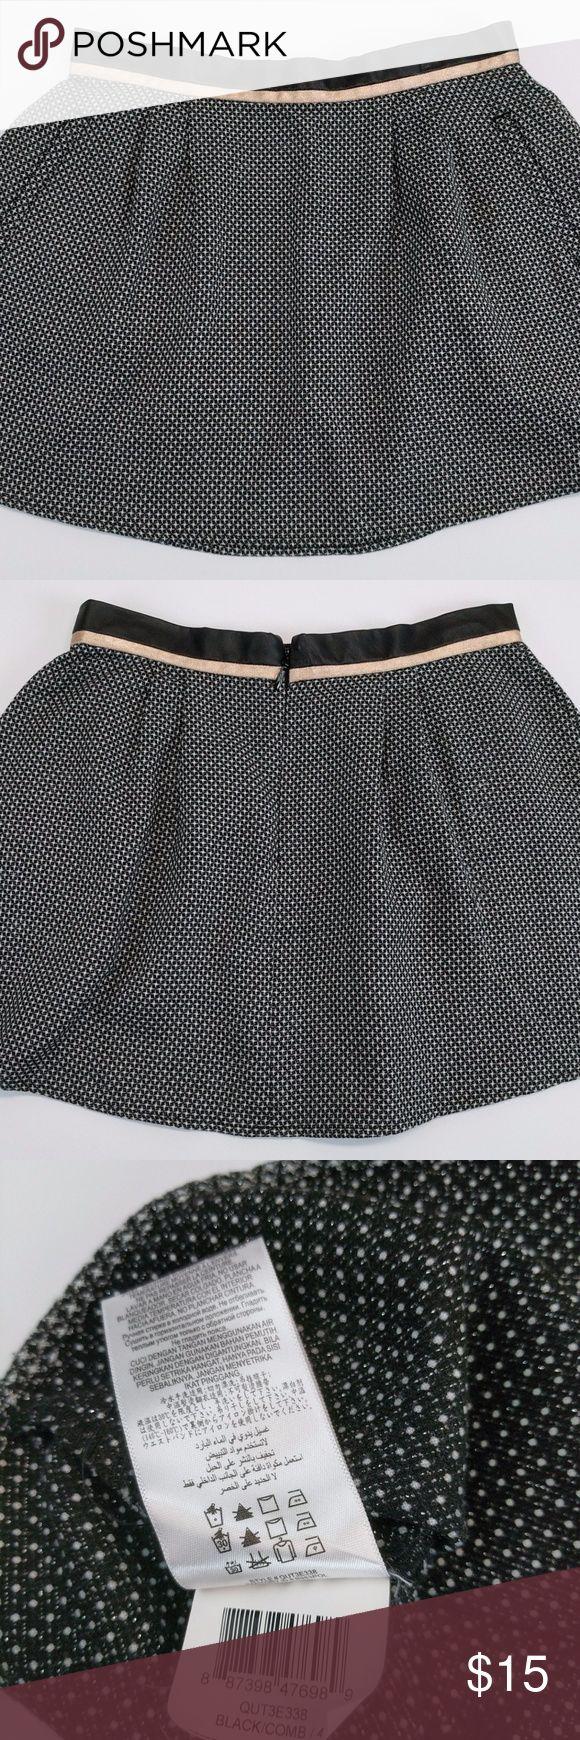 BCBGeneration Skirt Sz 4 Circle Mini Comb Pattern Black & White  Welt Pockets  Tag Size: 4 Waist - across waistband, doubled: 28 Hips - across, doubled: 44 Length - top to bottom: 15 Leg Opening - across bottom: 28  [05861] BCBGeneration Skirts Mini